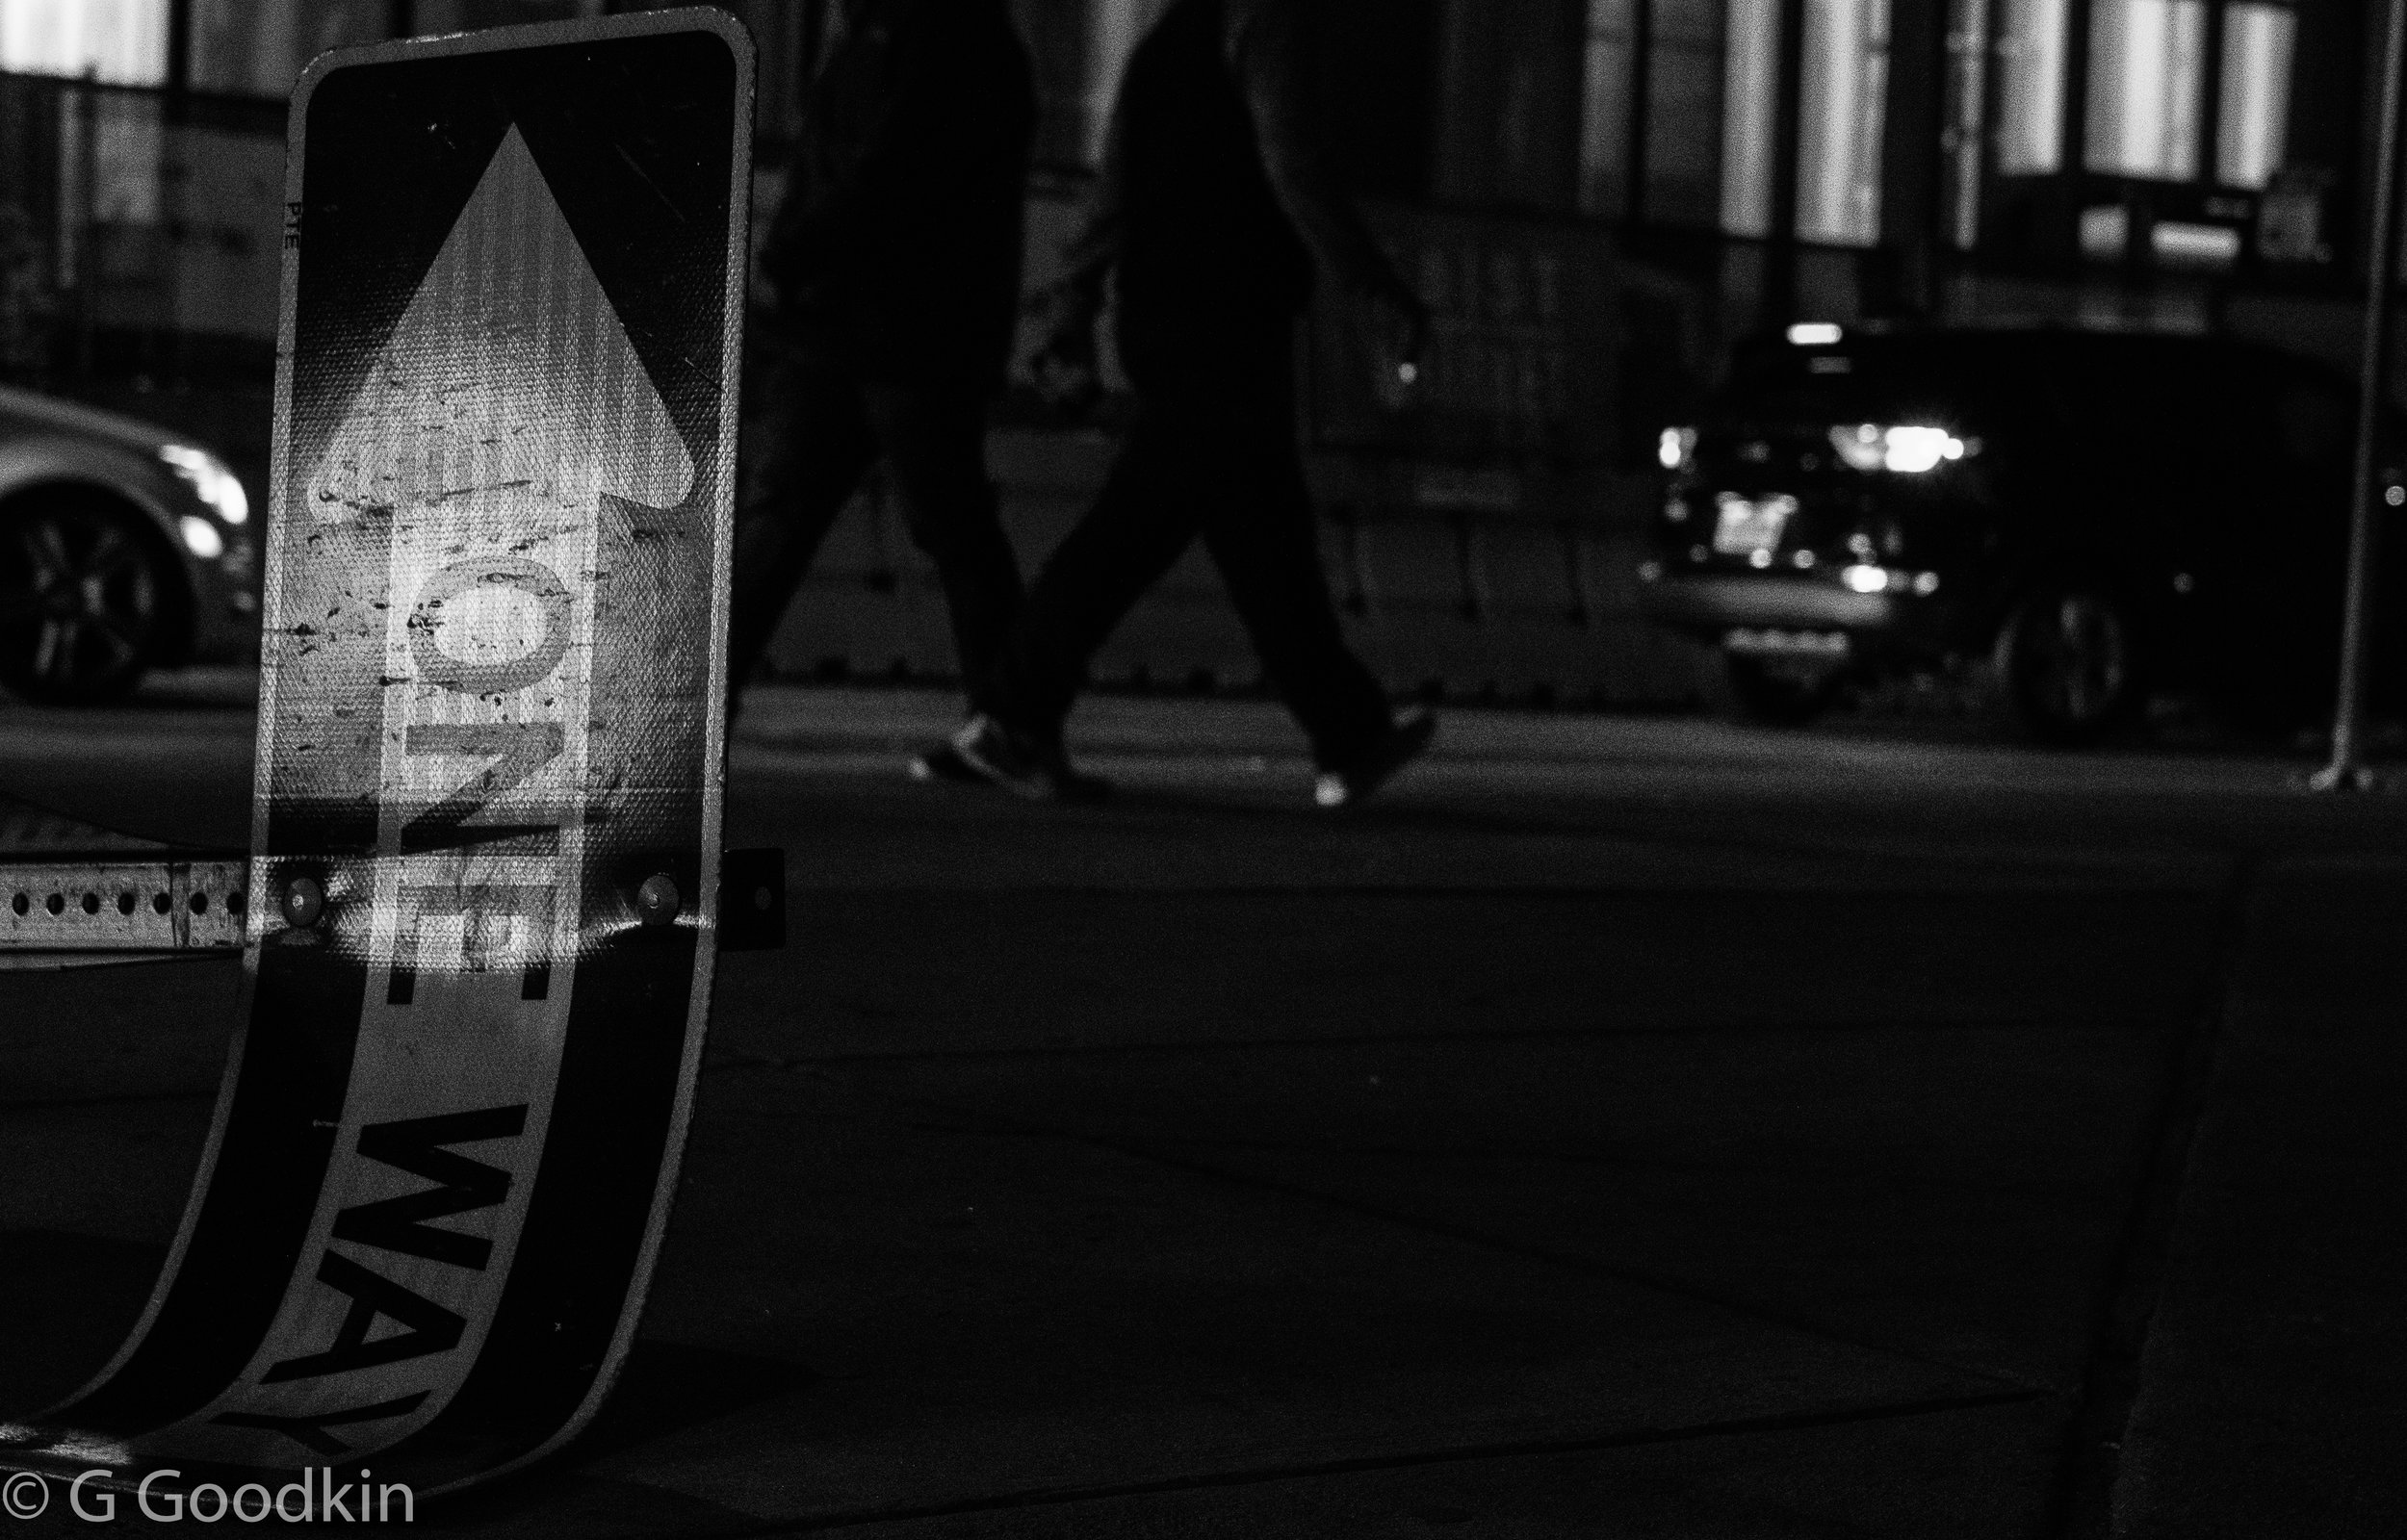 2017_12_01_philadelphia_street-134bnw.jpg